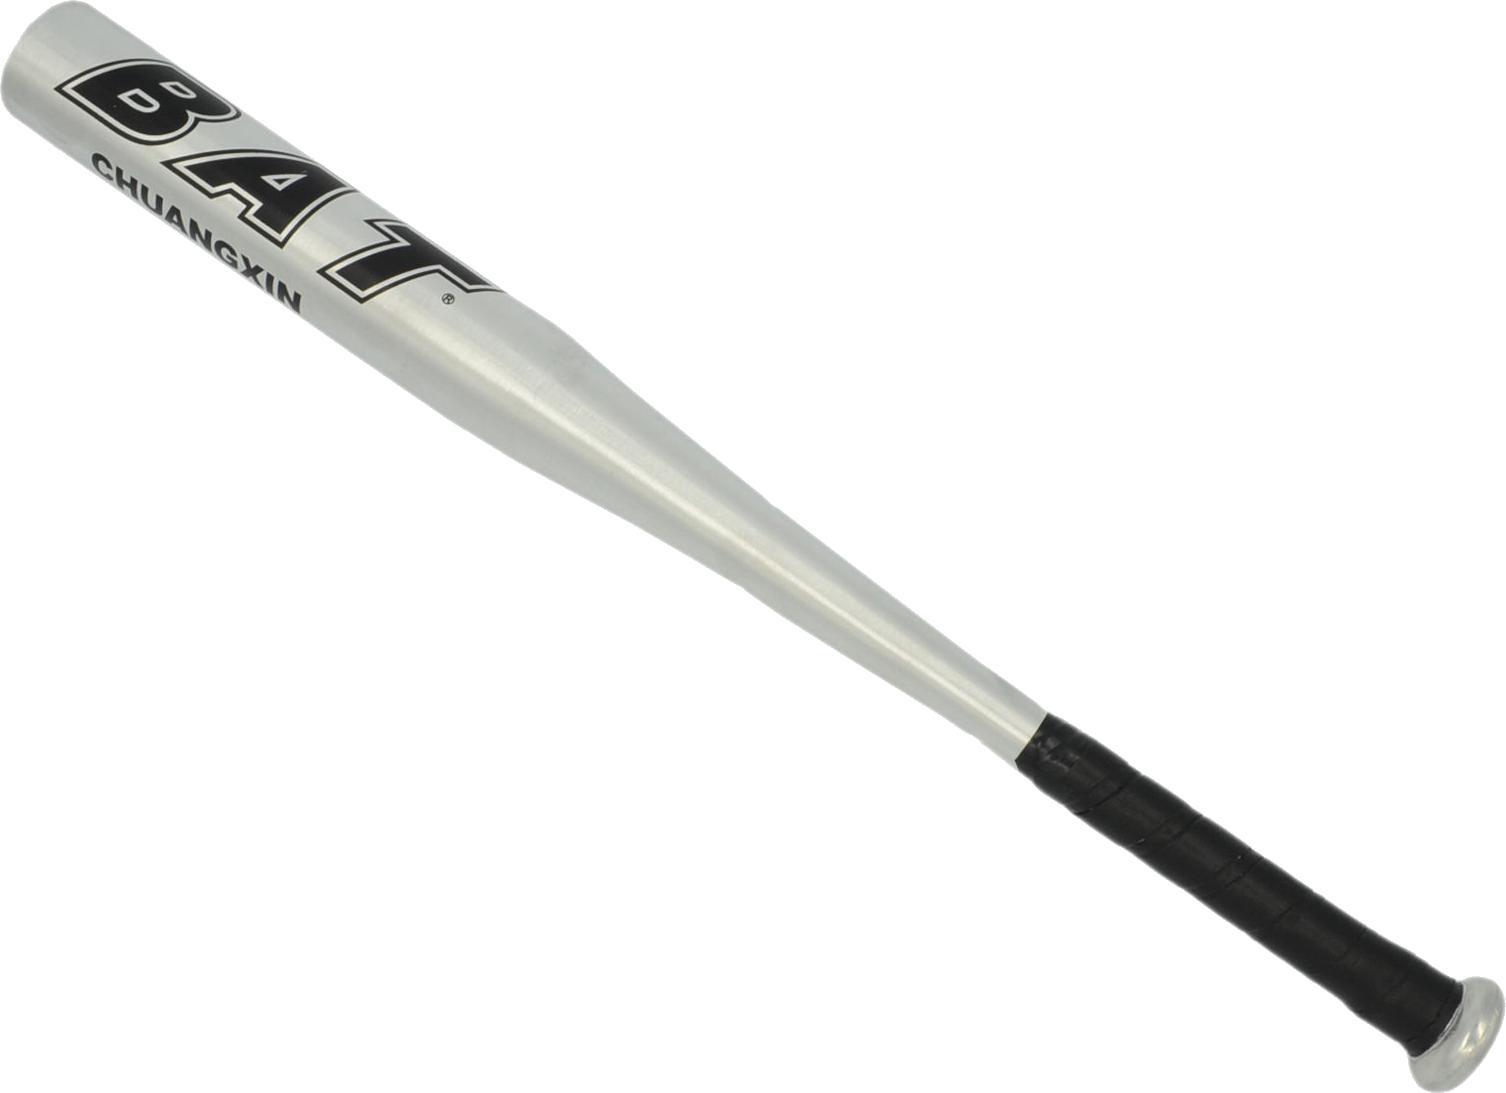 Baseball Bat Png Image Baseball Bat Baseball Image